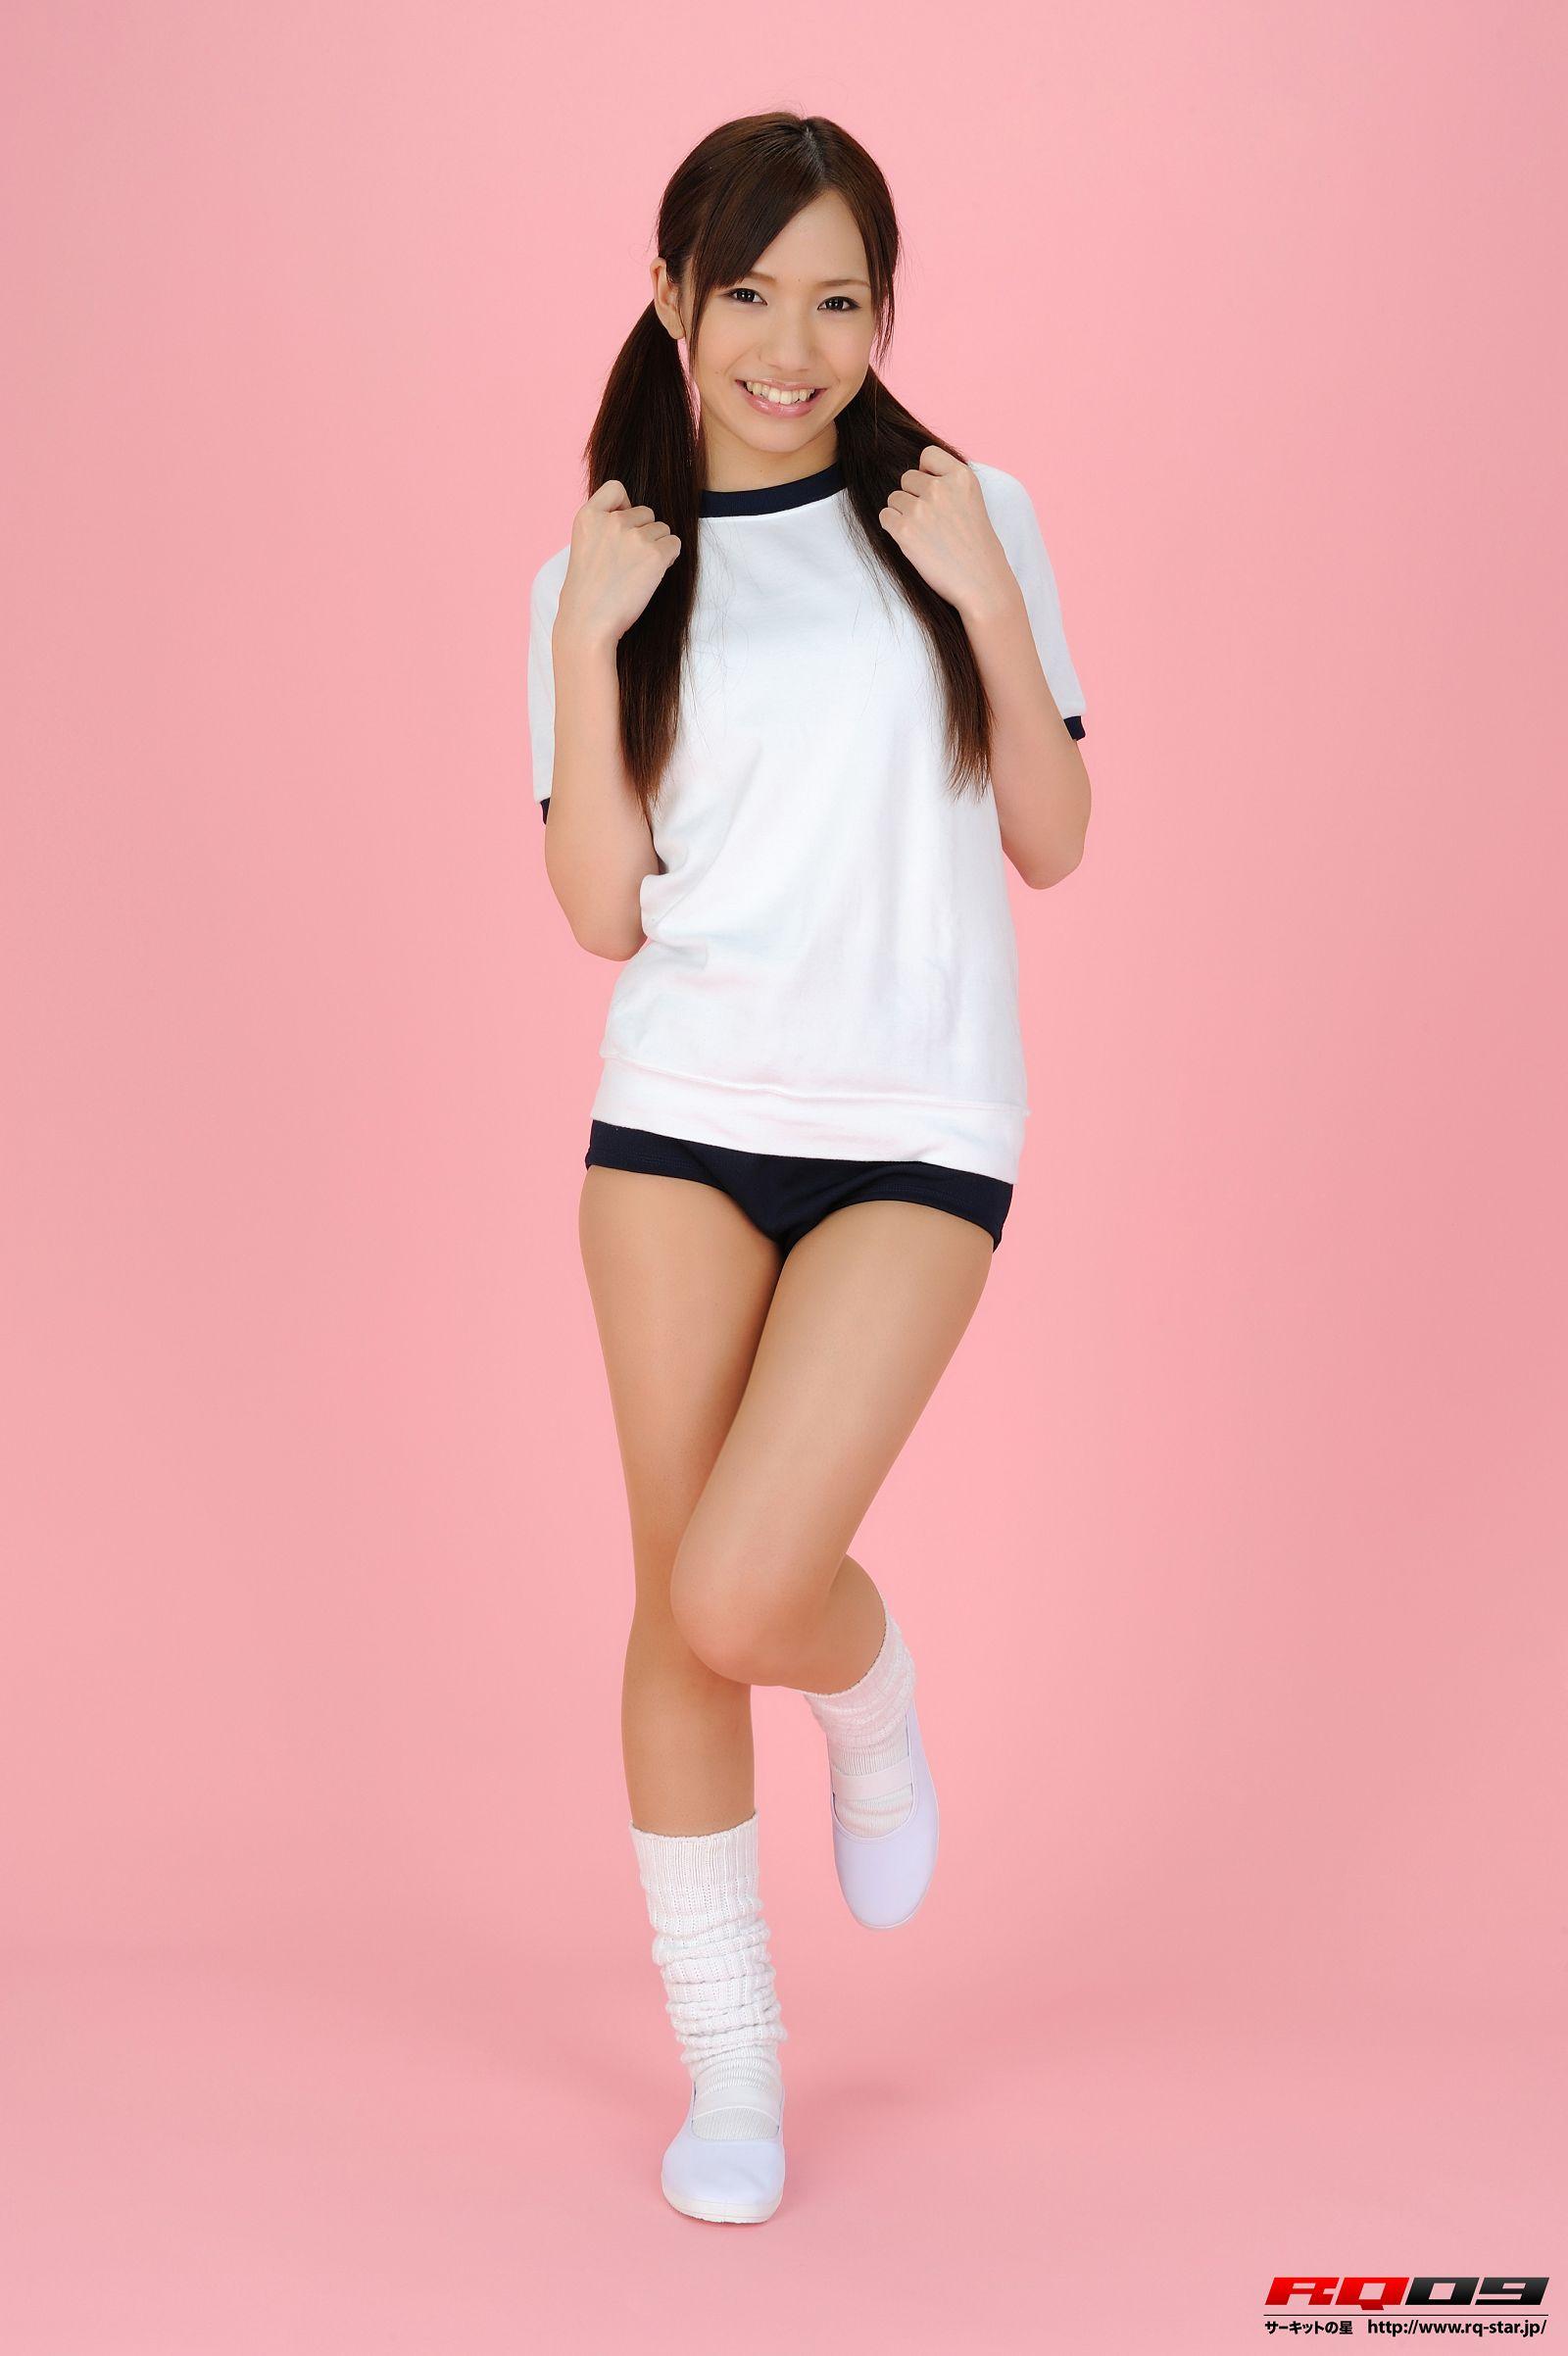 [RQ STAR美女] NO.0227 Asami Nakata 中田あさみ Bloomers Gymwear[70P] RQ STAR 第1张